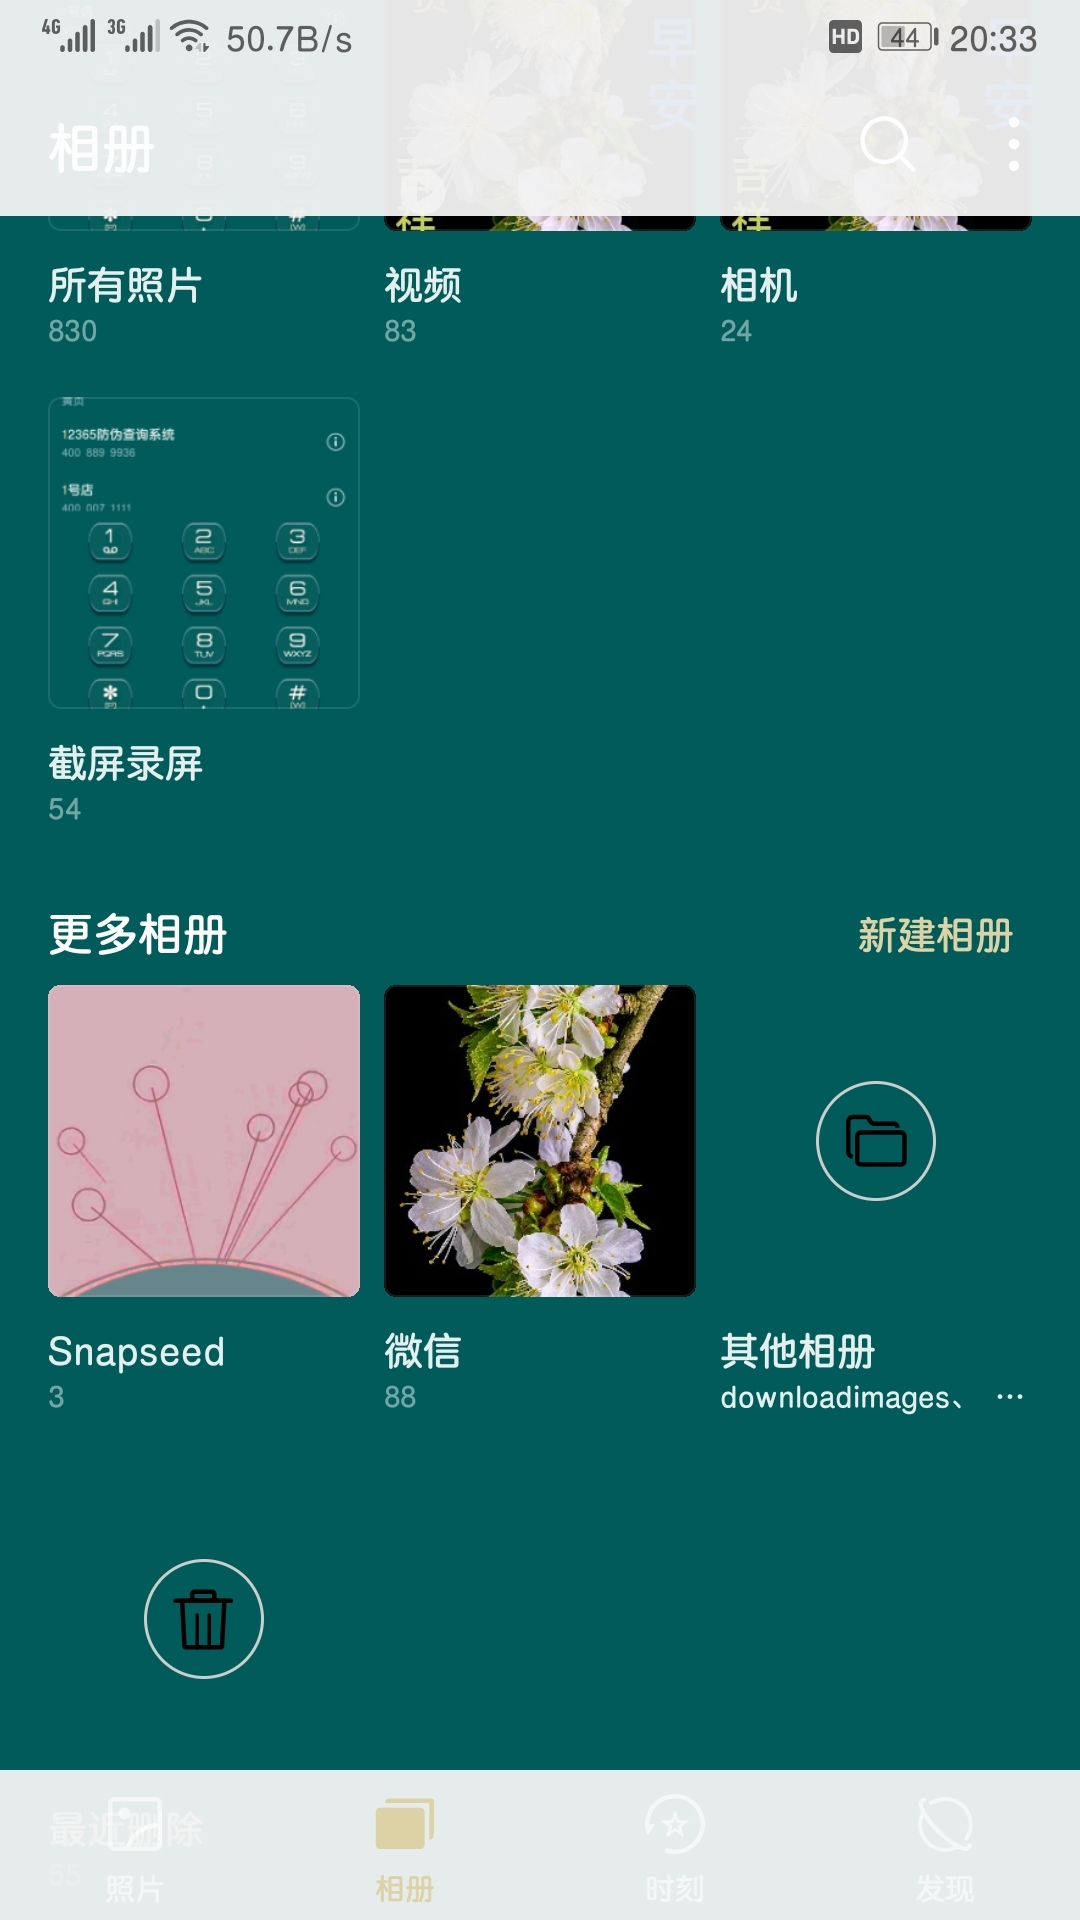 Screenshot_20200512_203341_com.android.gallery3d.jpg